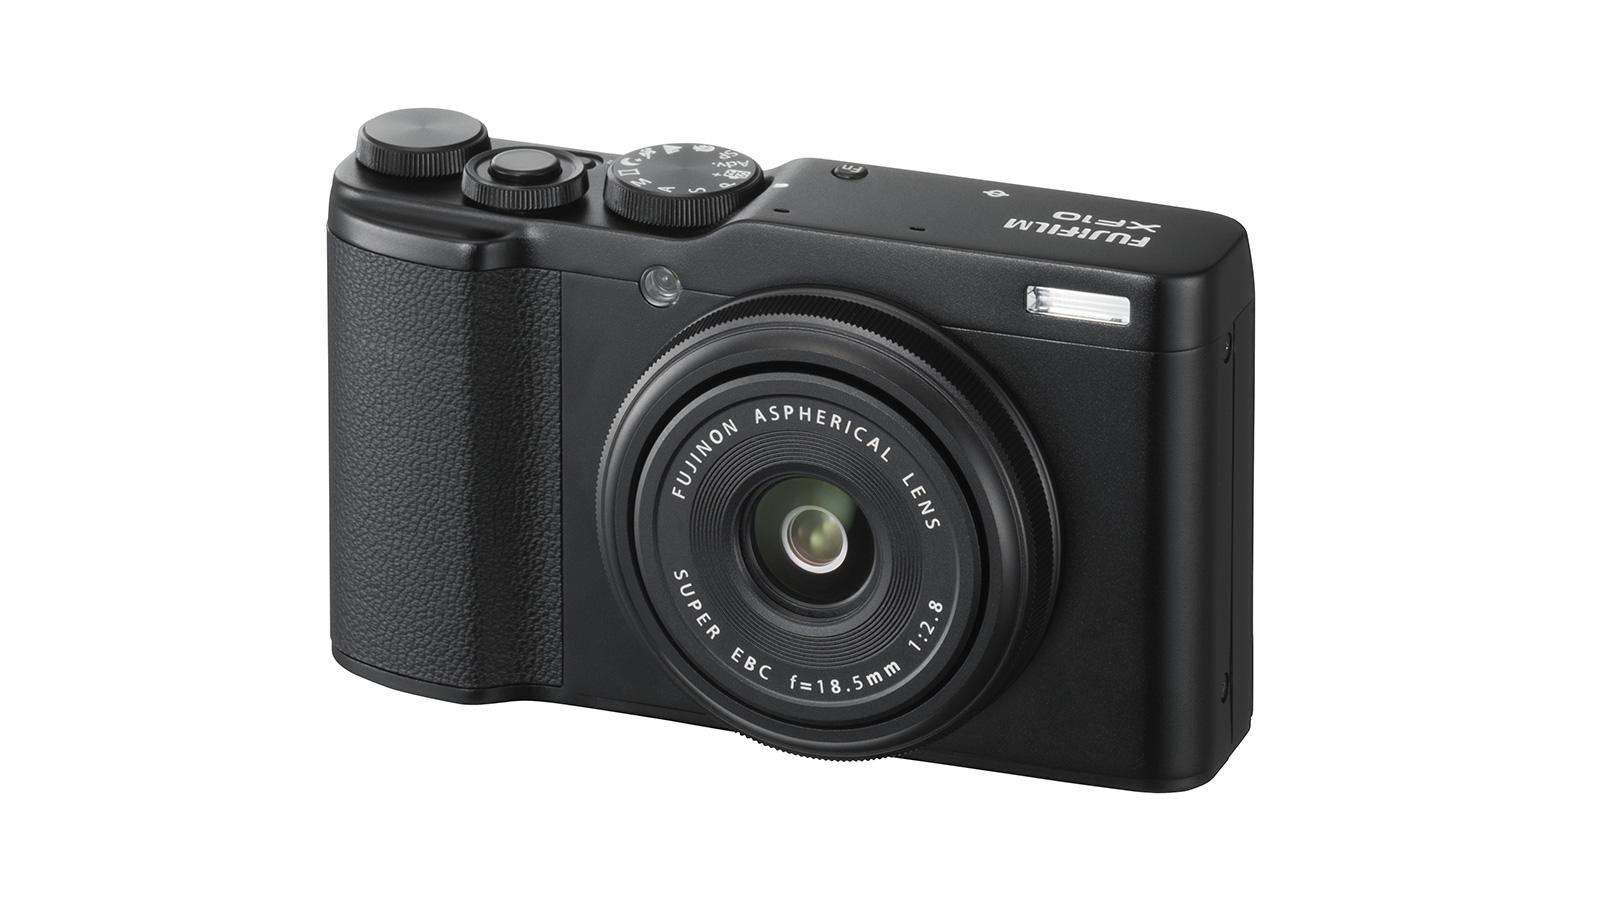 Fujifilm Announces XF10, 8-16mm F2.8 and 200mm F2